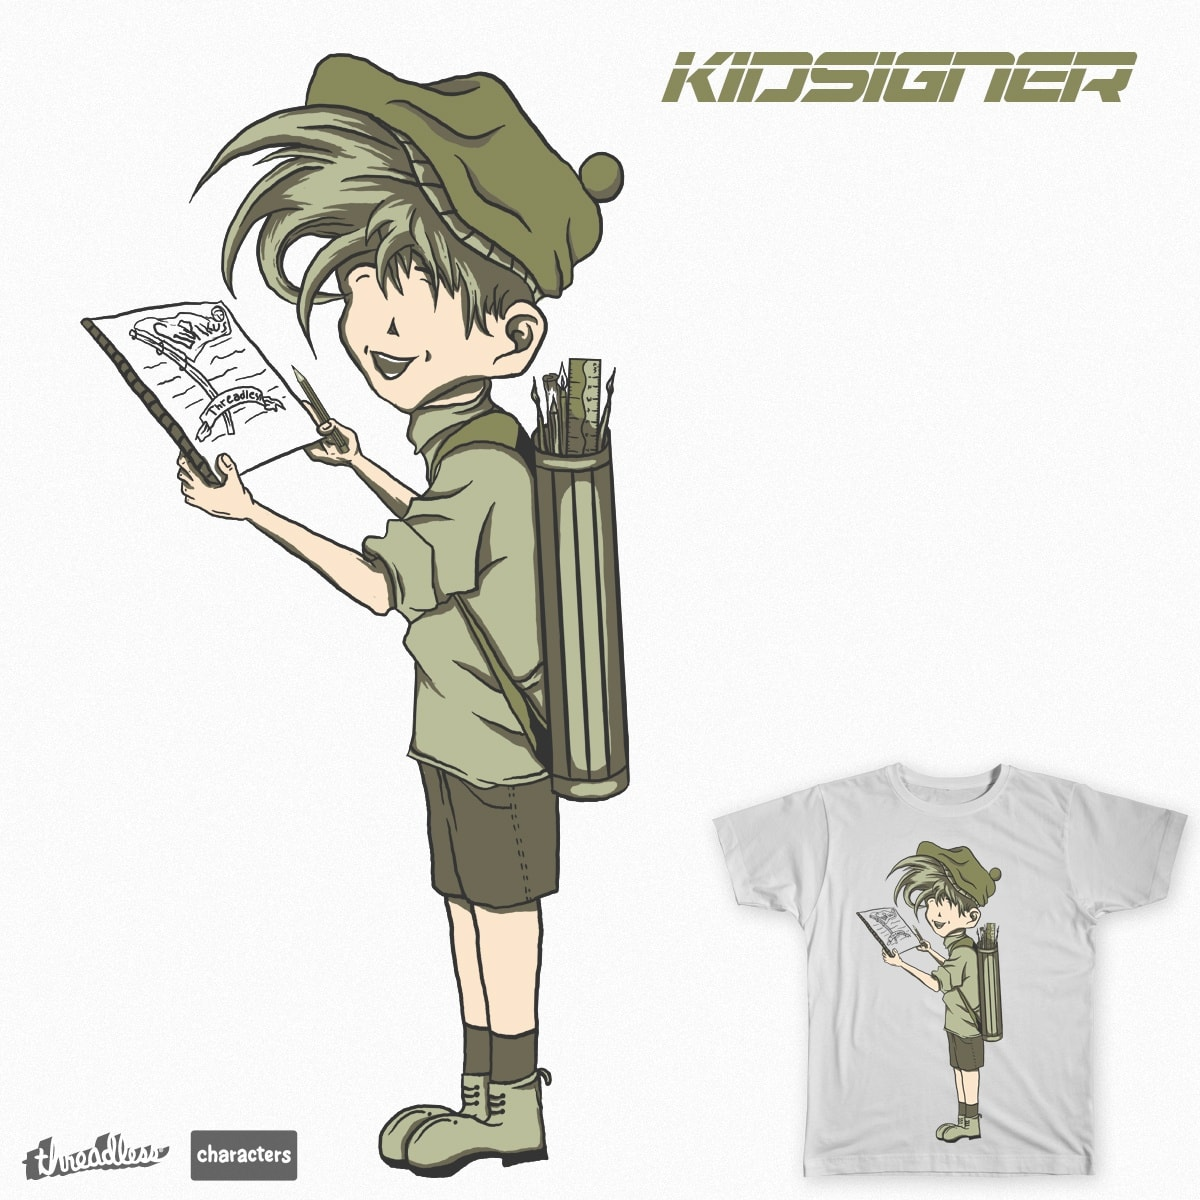 kidsigner by gupikus on Threadless